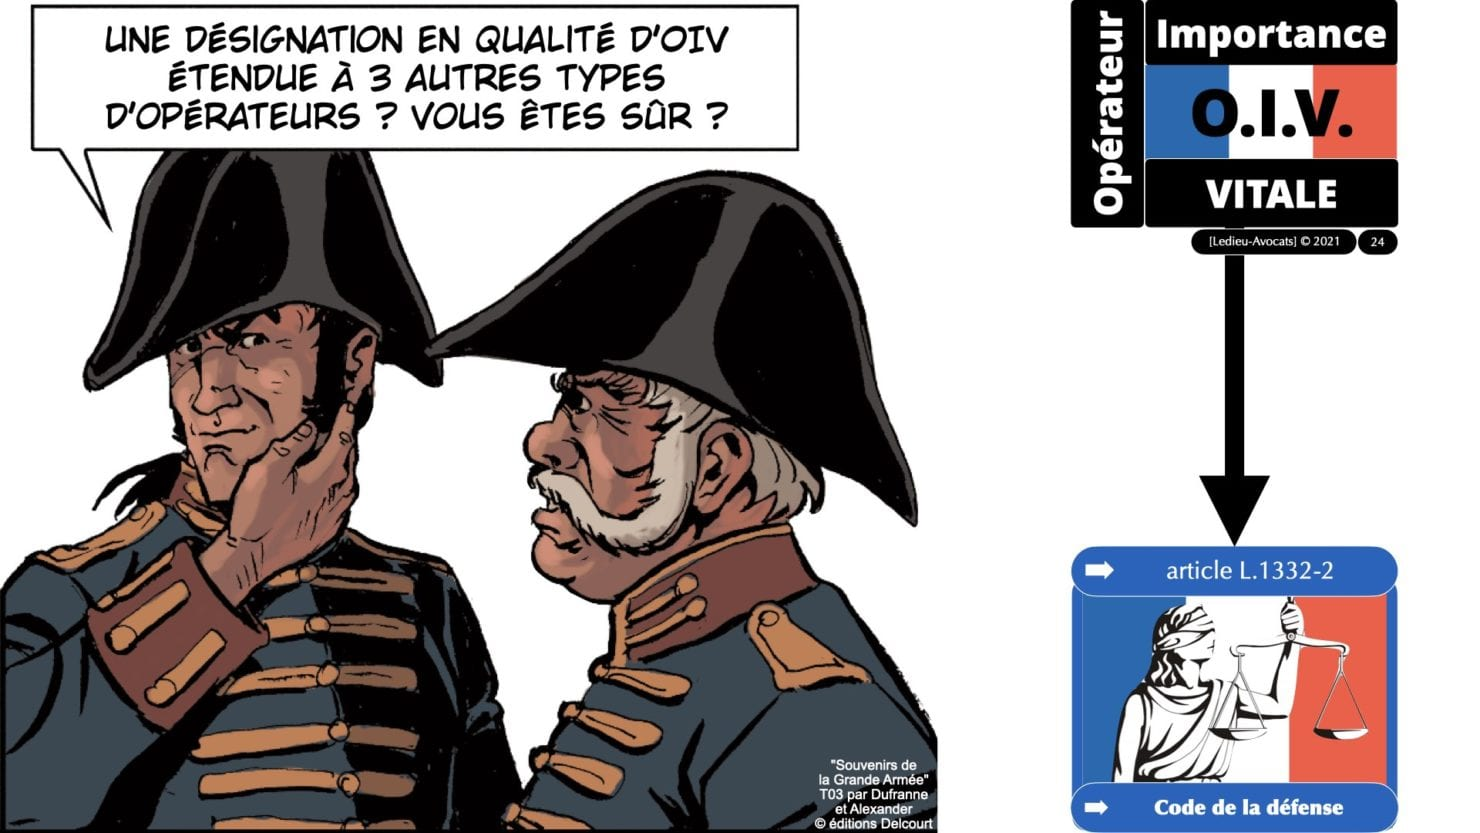 337 cyber sécurité #1 OIV OSE Critical Entities © Ledieu-avocat 15-06-2021.024